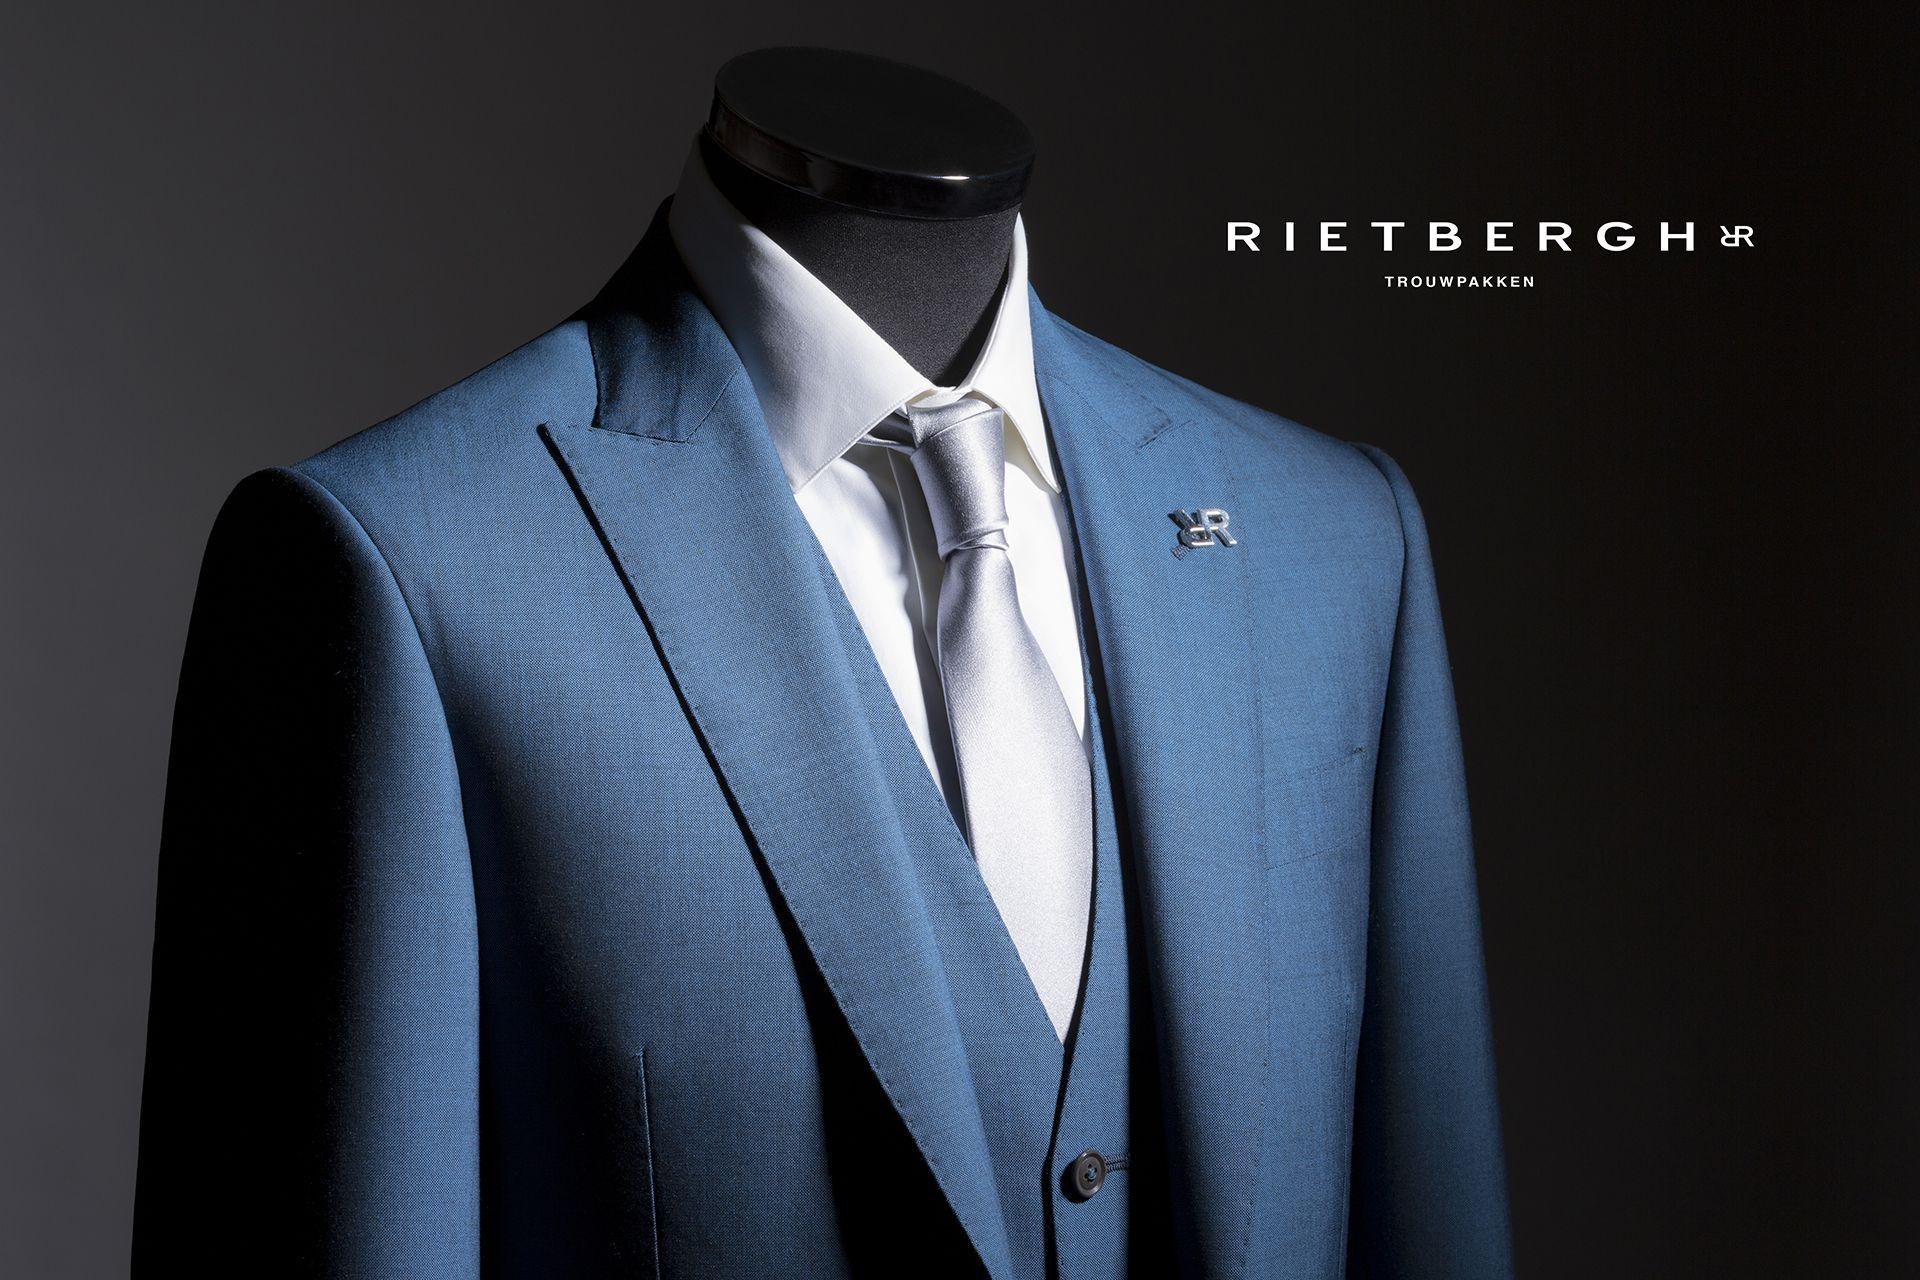 Unieke kleur blauw trouwpak / unique wedding suits | Blauwe ...